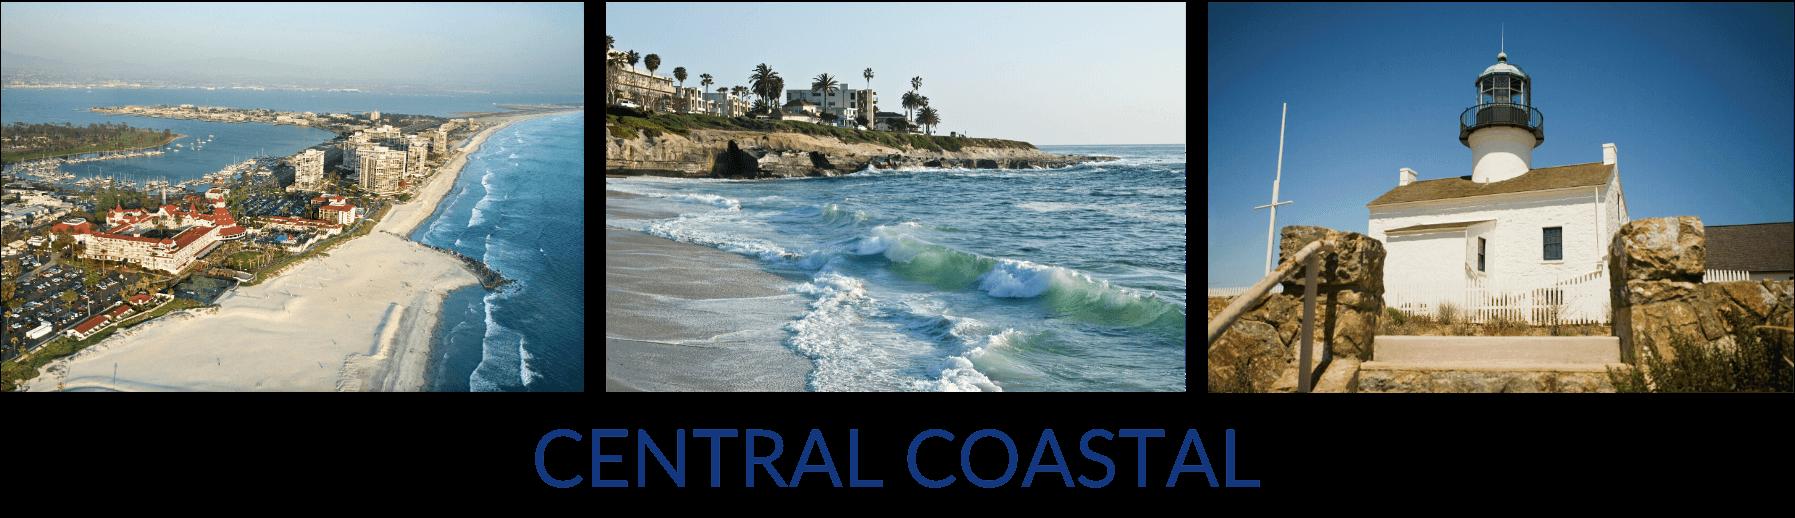 Central Coastal-2